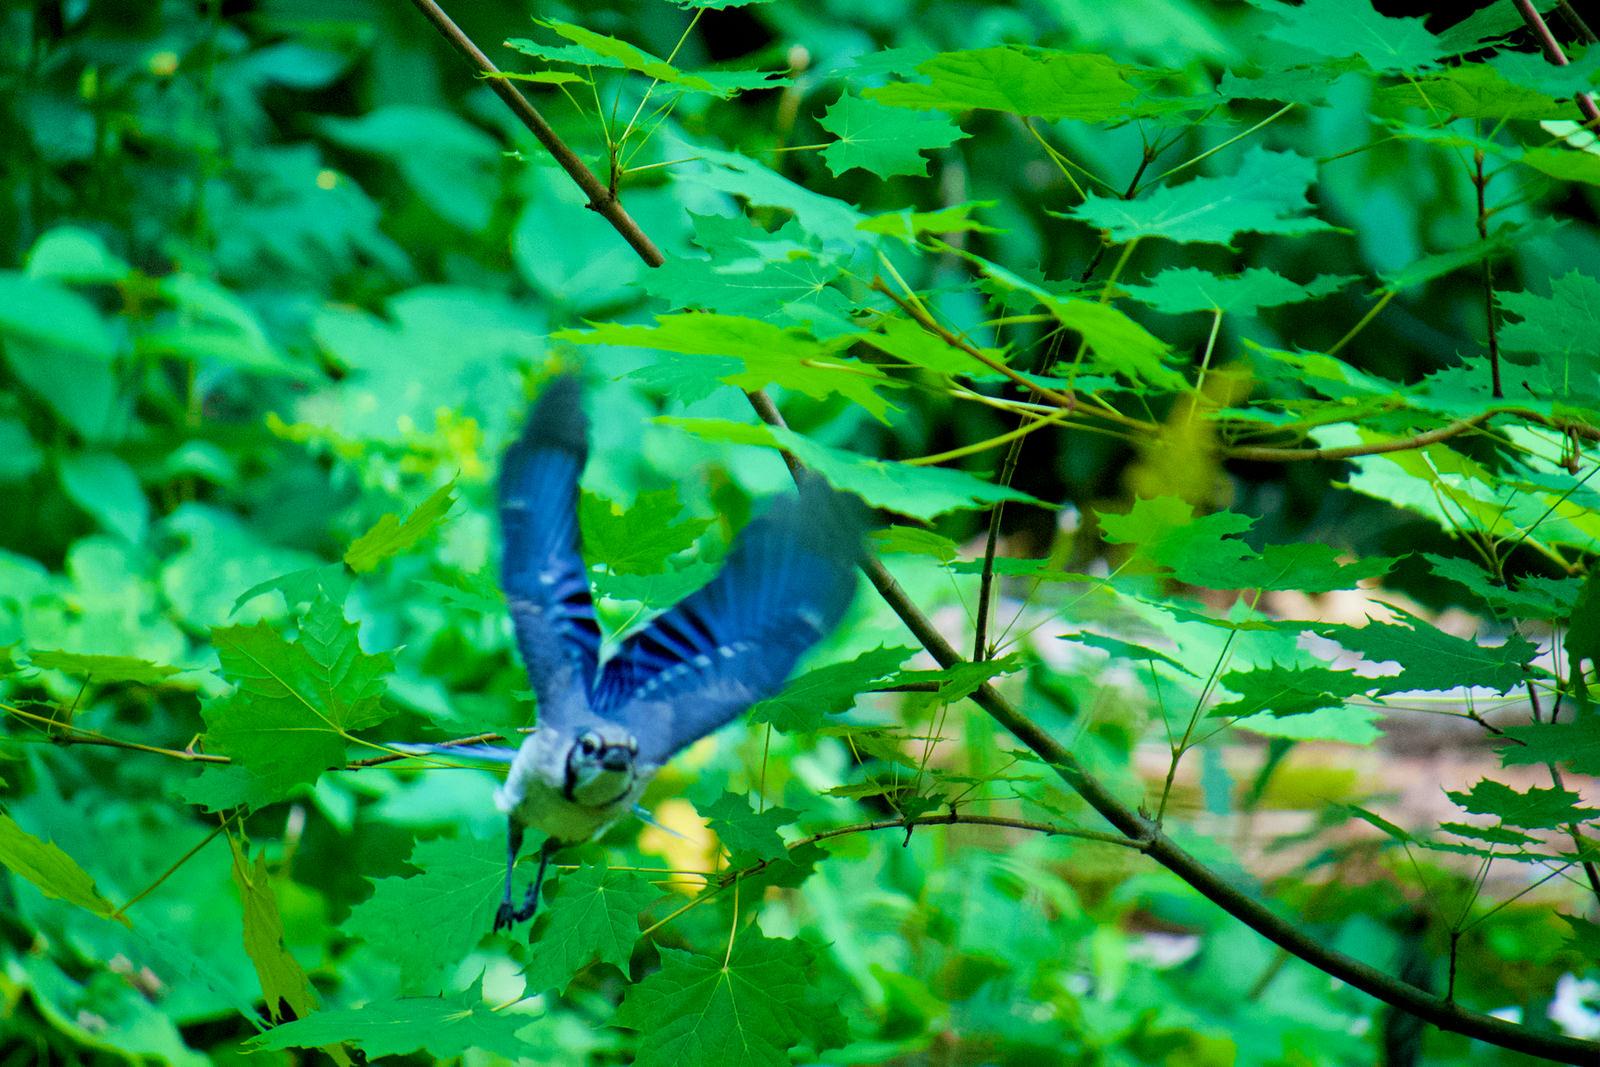 Un geai bleu prenant son envol.